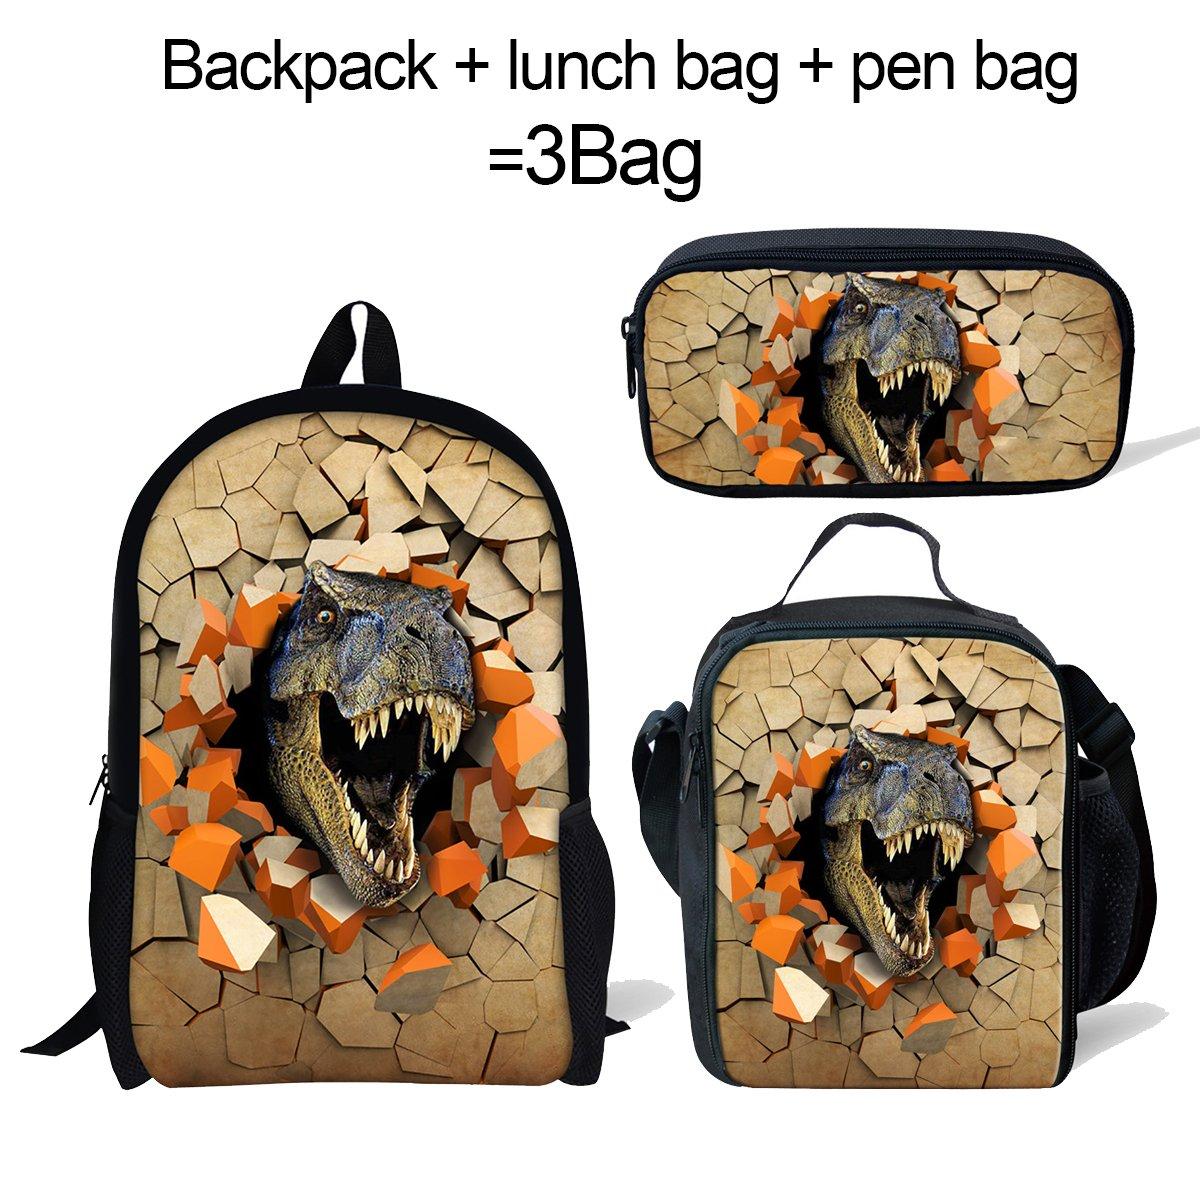 ThiKin Cute Cat Dog Animal Blue School Backpack For Boys Girls School Book Bags CA5193C_XKS